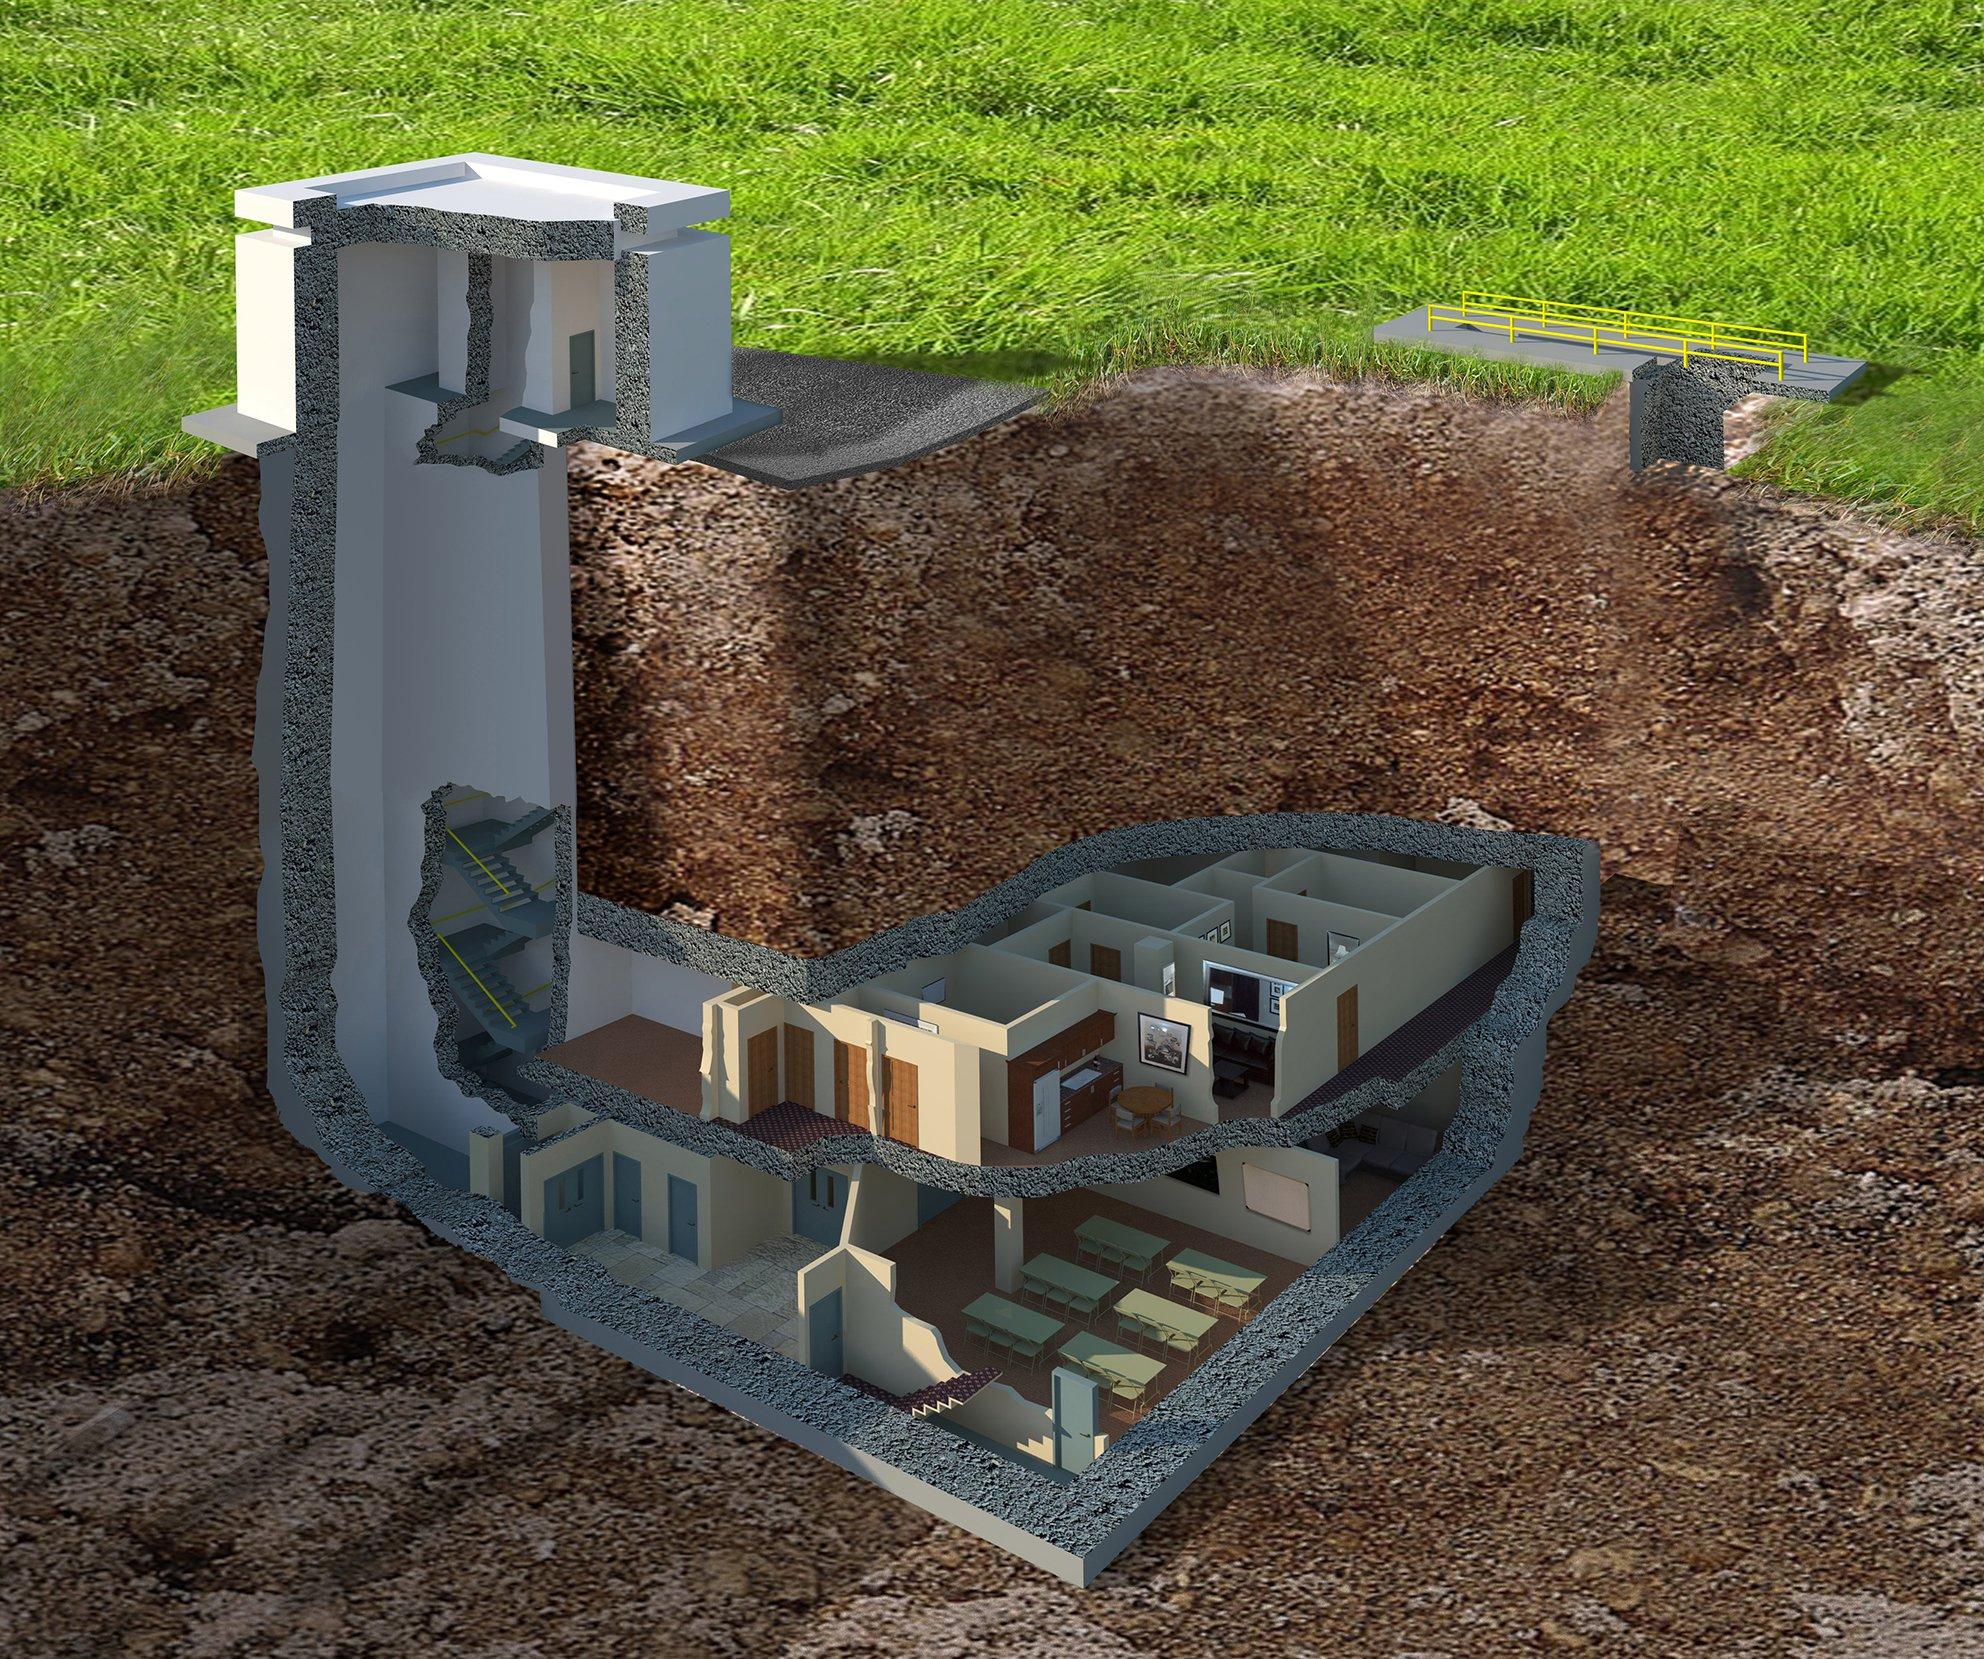 "Uživatel Architectural Digest na Twitteru: ""Massive underground bunker in  Georgia goes on sale for $17.5 million: https://t.co/I7YmtlIhgP  https://t.co/WYszNXxtQ9"""